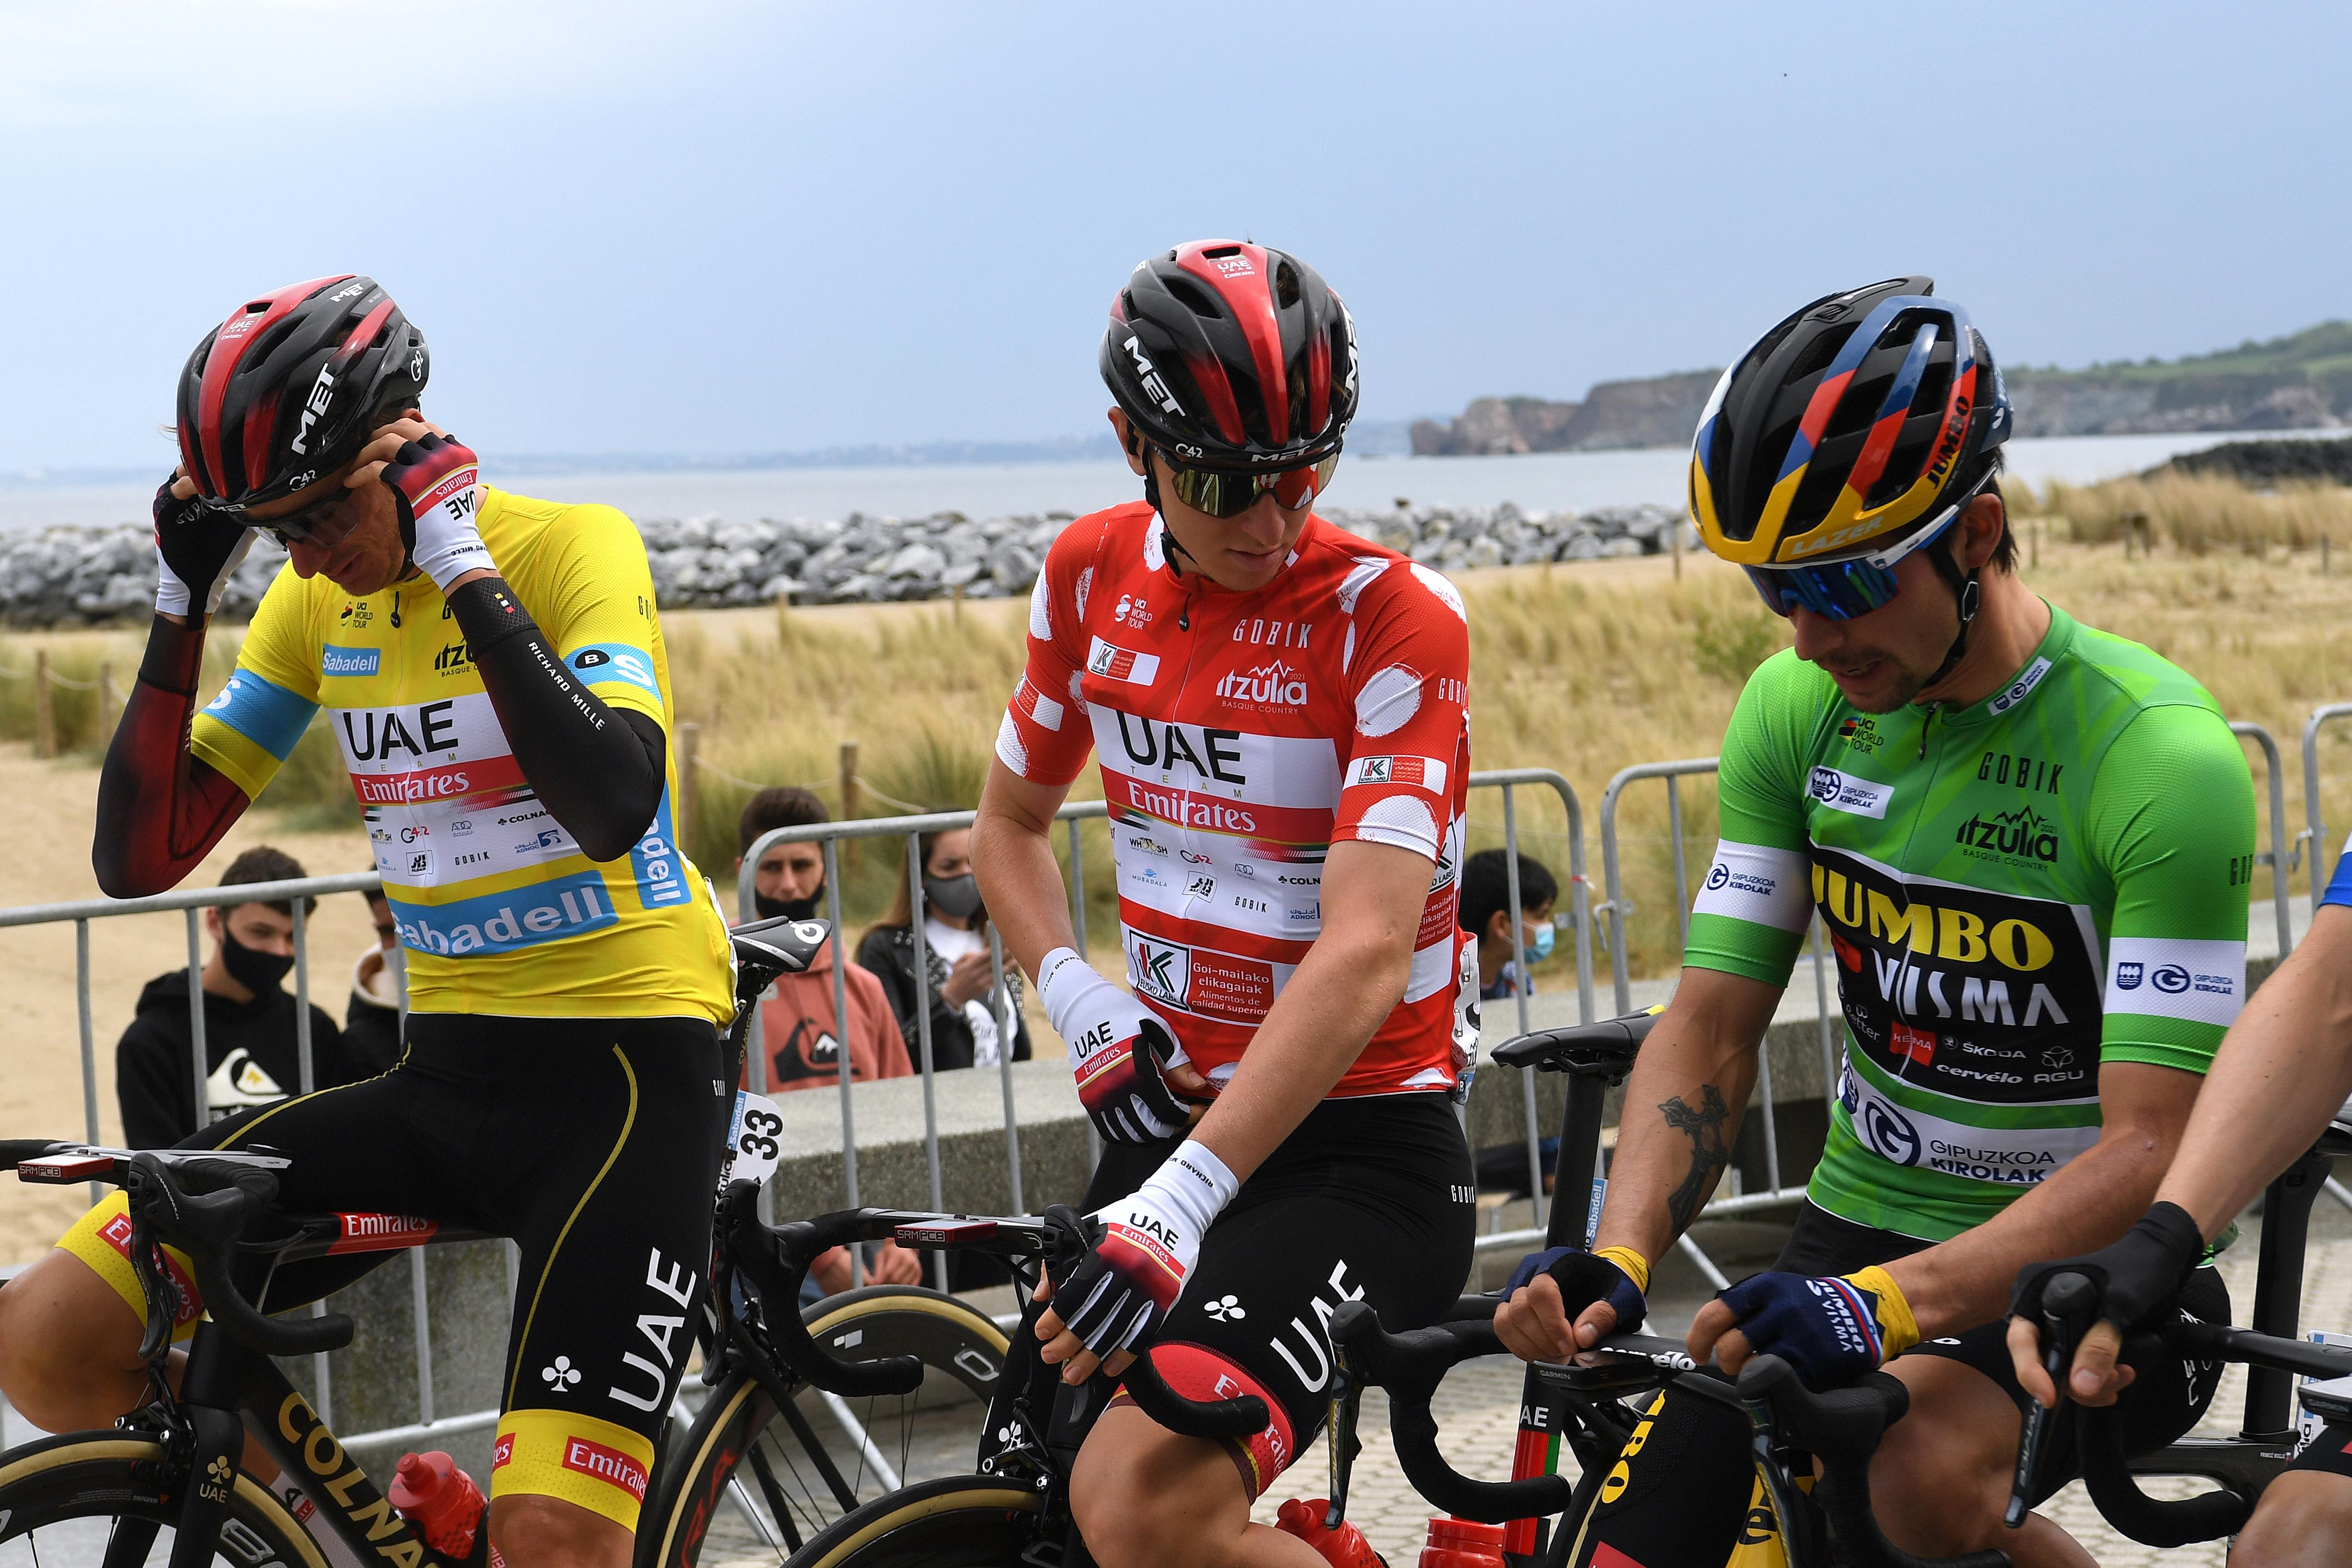 60th Itzulia-Vuelta Ciclista Pais Vasco 2021 - Stage 5